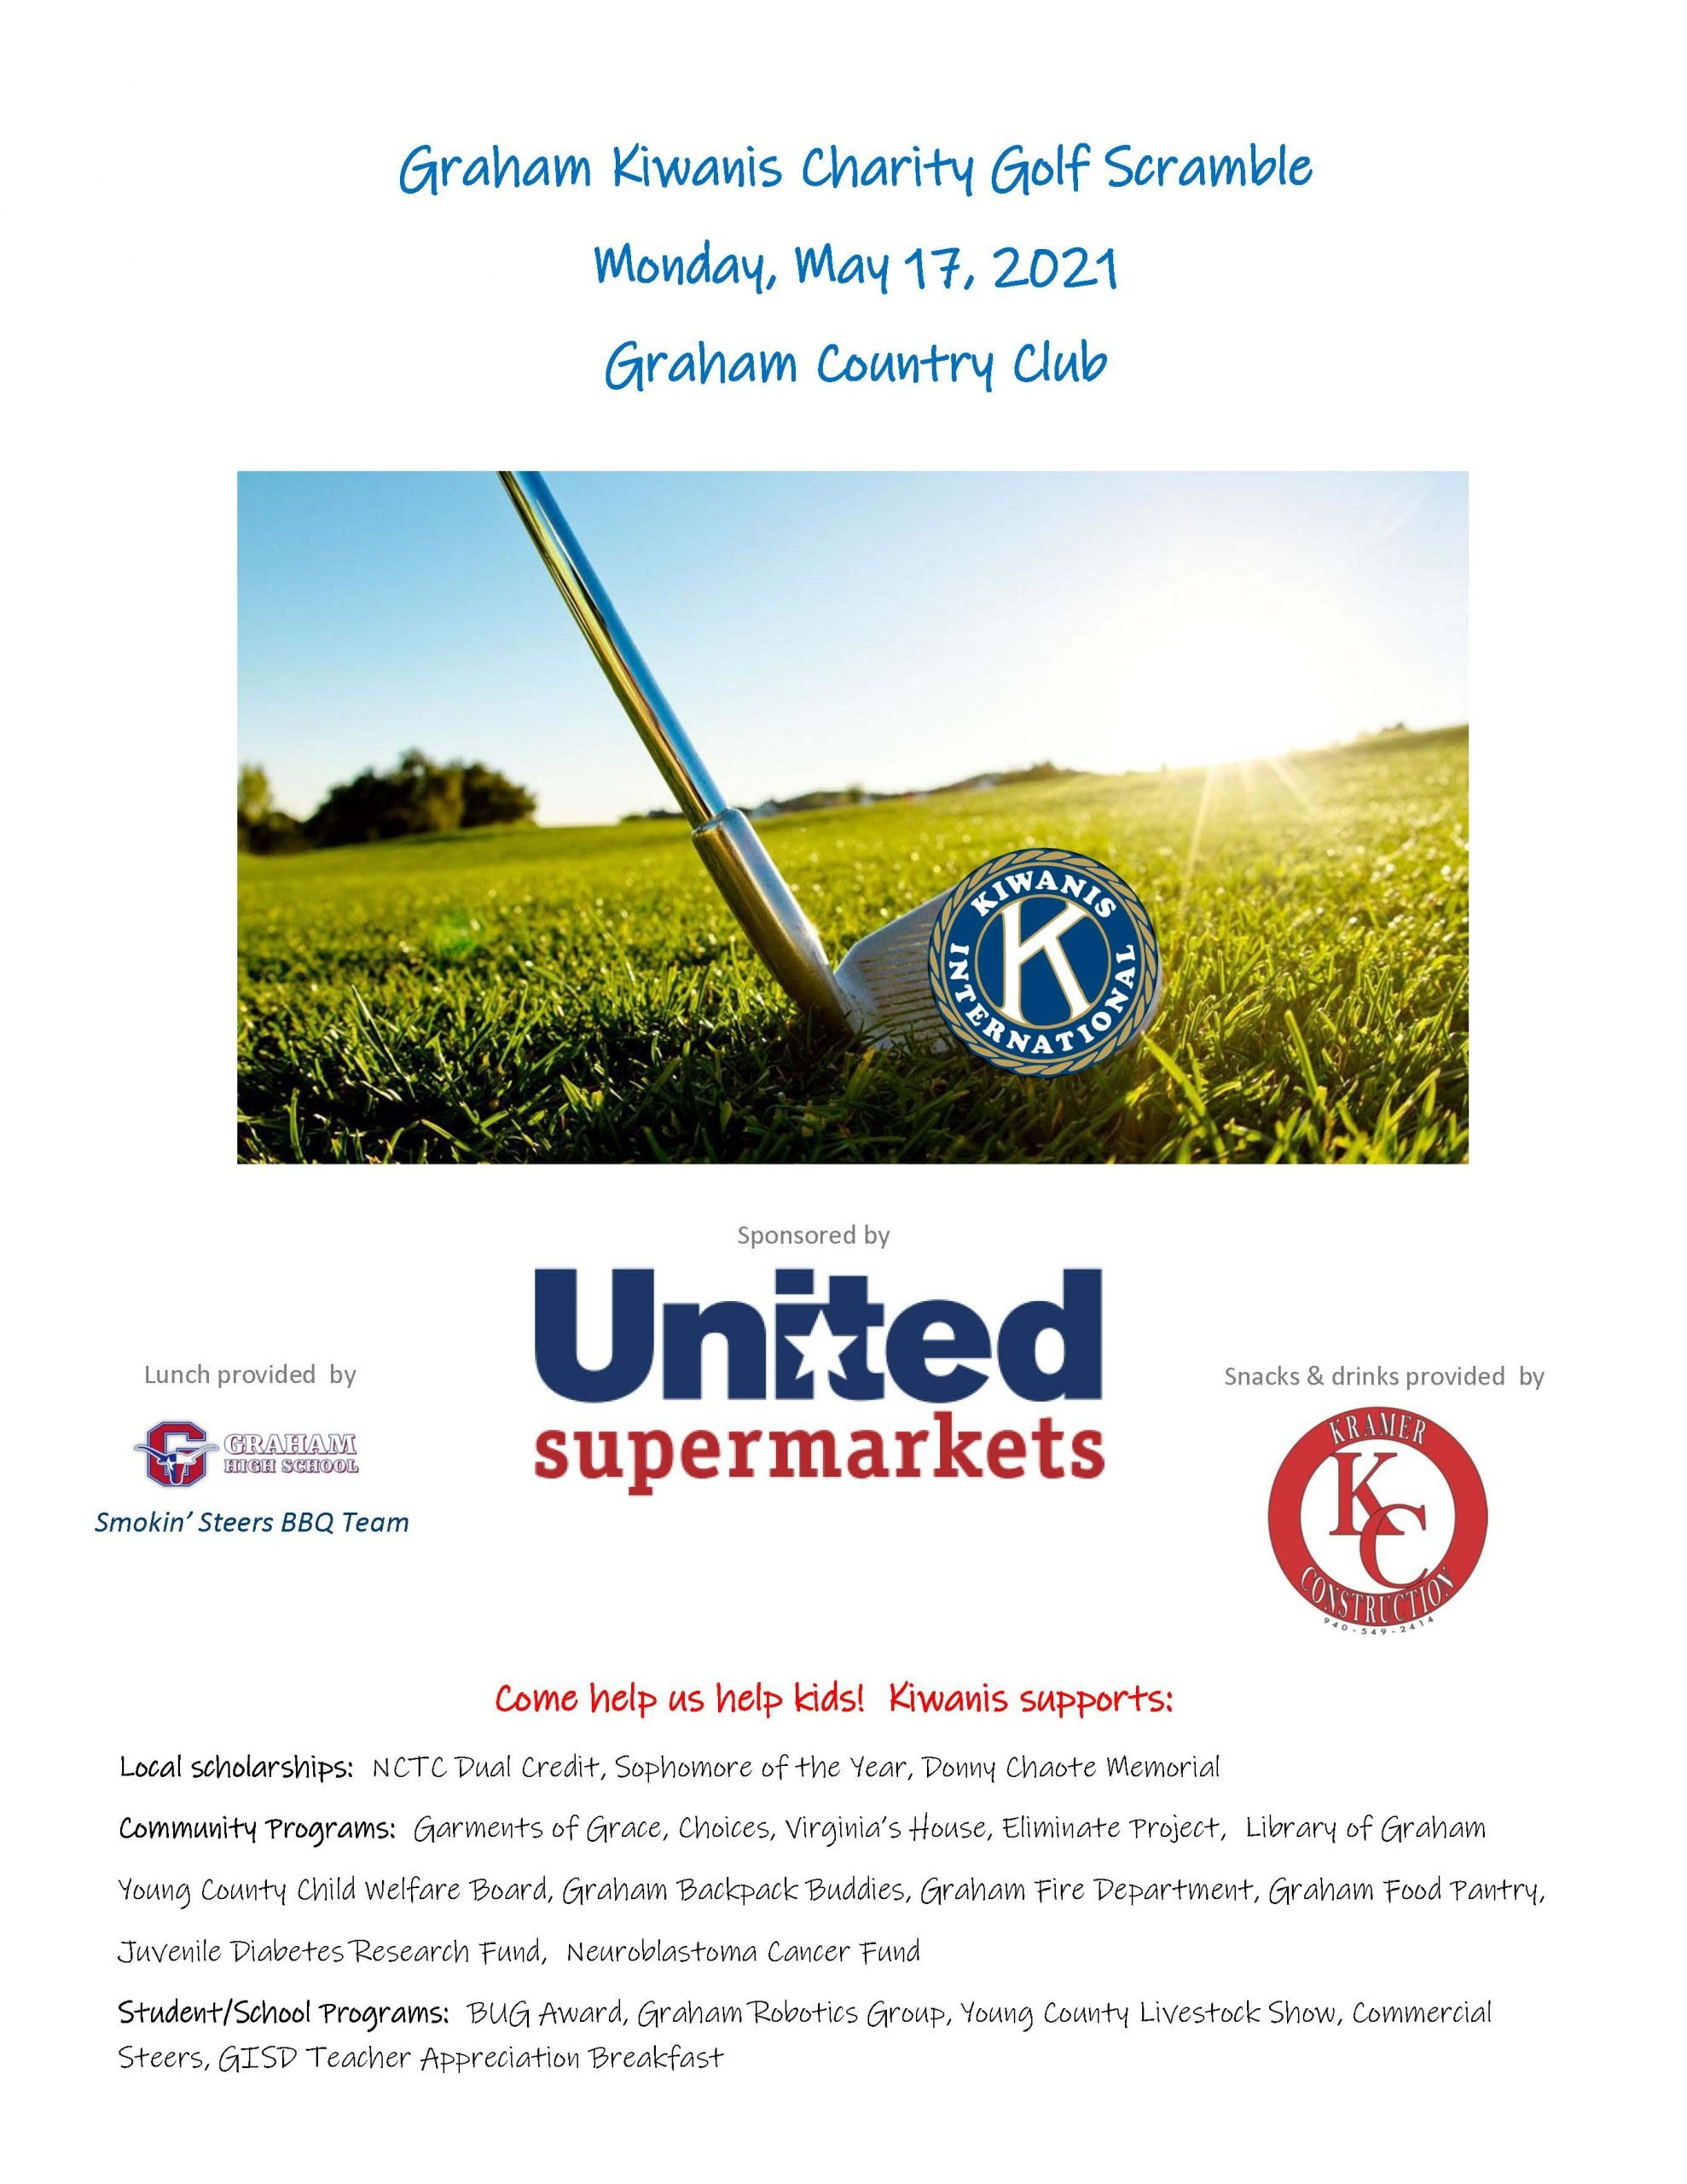 Kiwanis Golf Tournament flyer